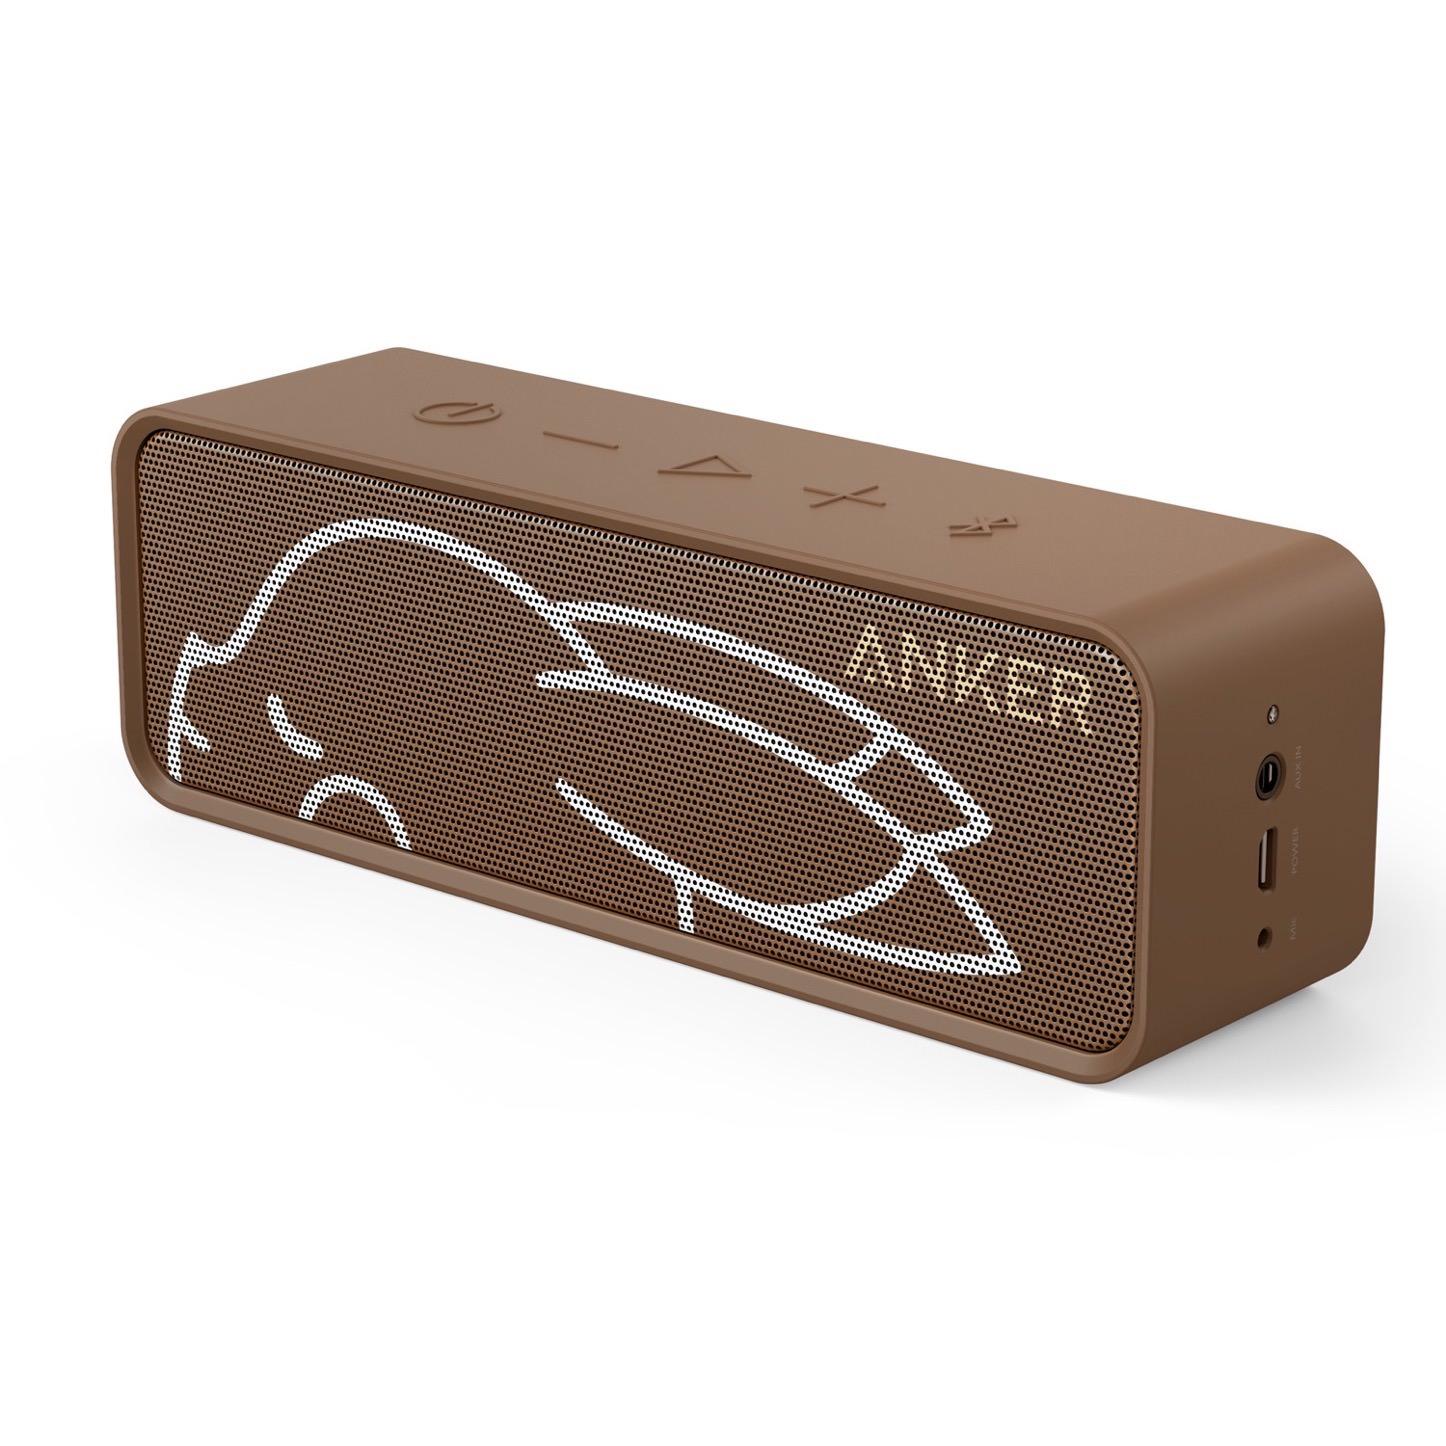 Anker-Pokemon-Mobile-Accessories-11.jpg